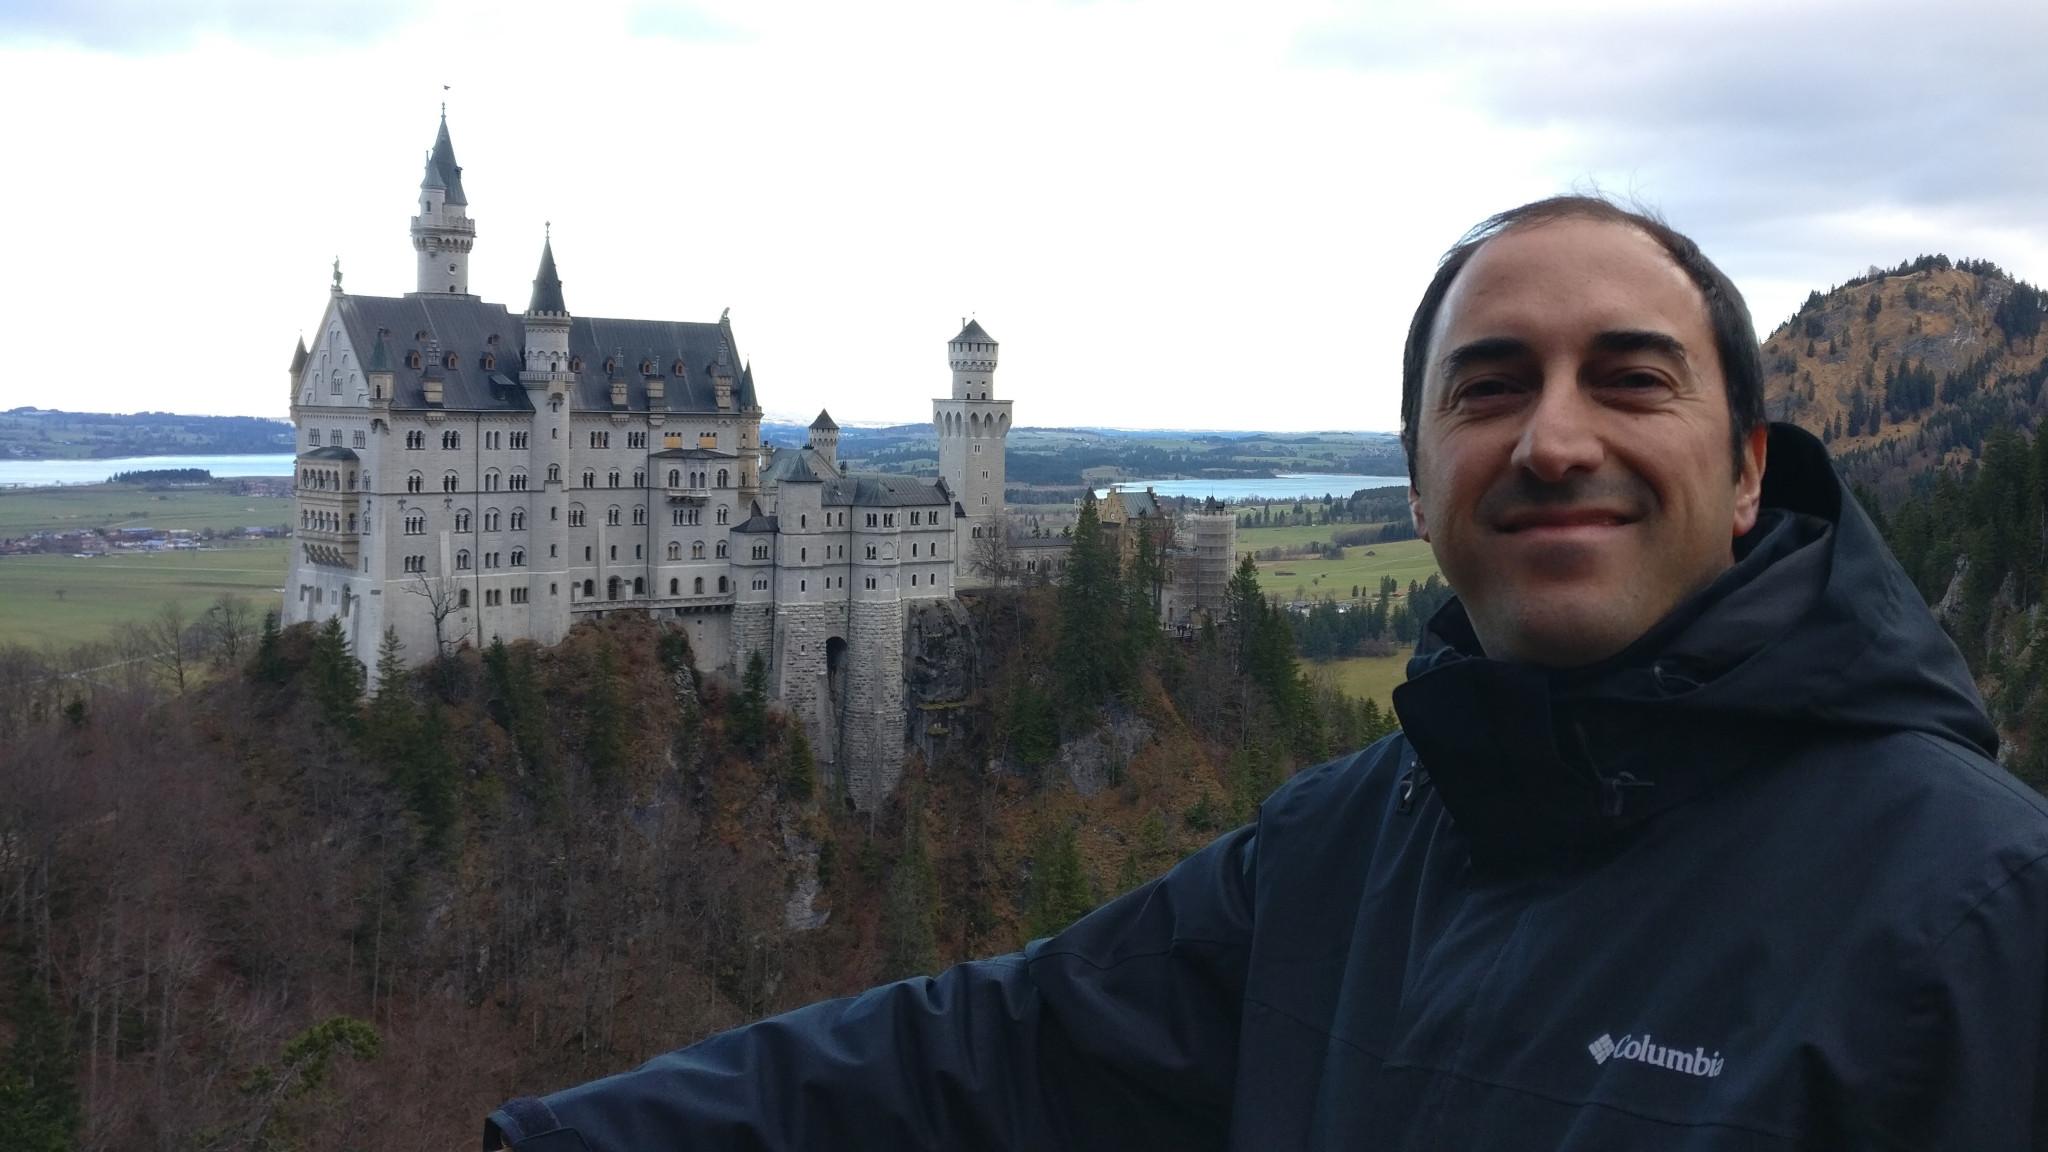 Splendid picture of the Neuschwanstein Castle from Marienbrucke